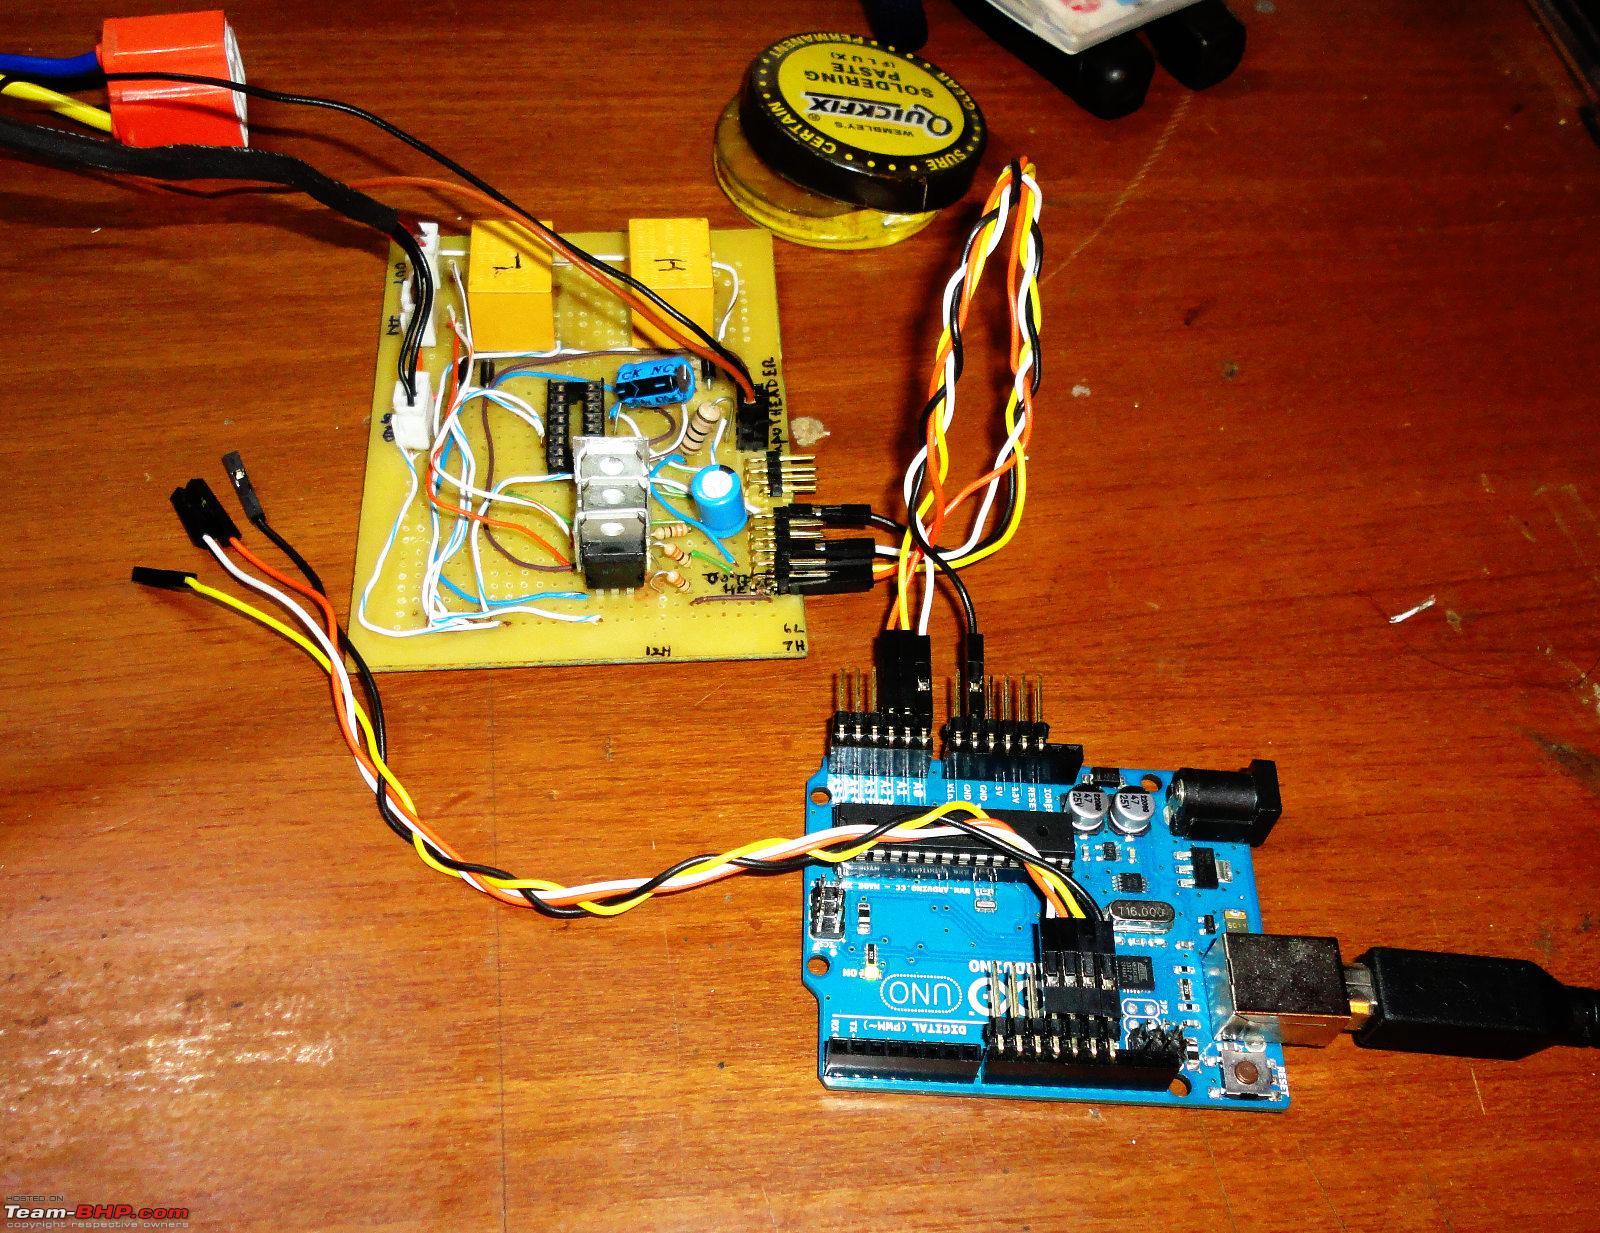 Diy project automatic headlamp control using arduino team bhp diy project automatic headlamp control using arduino dsc00004g solutioingenieria Images